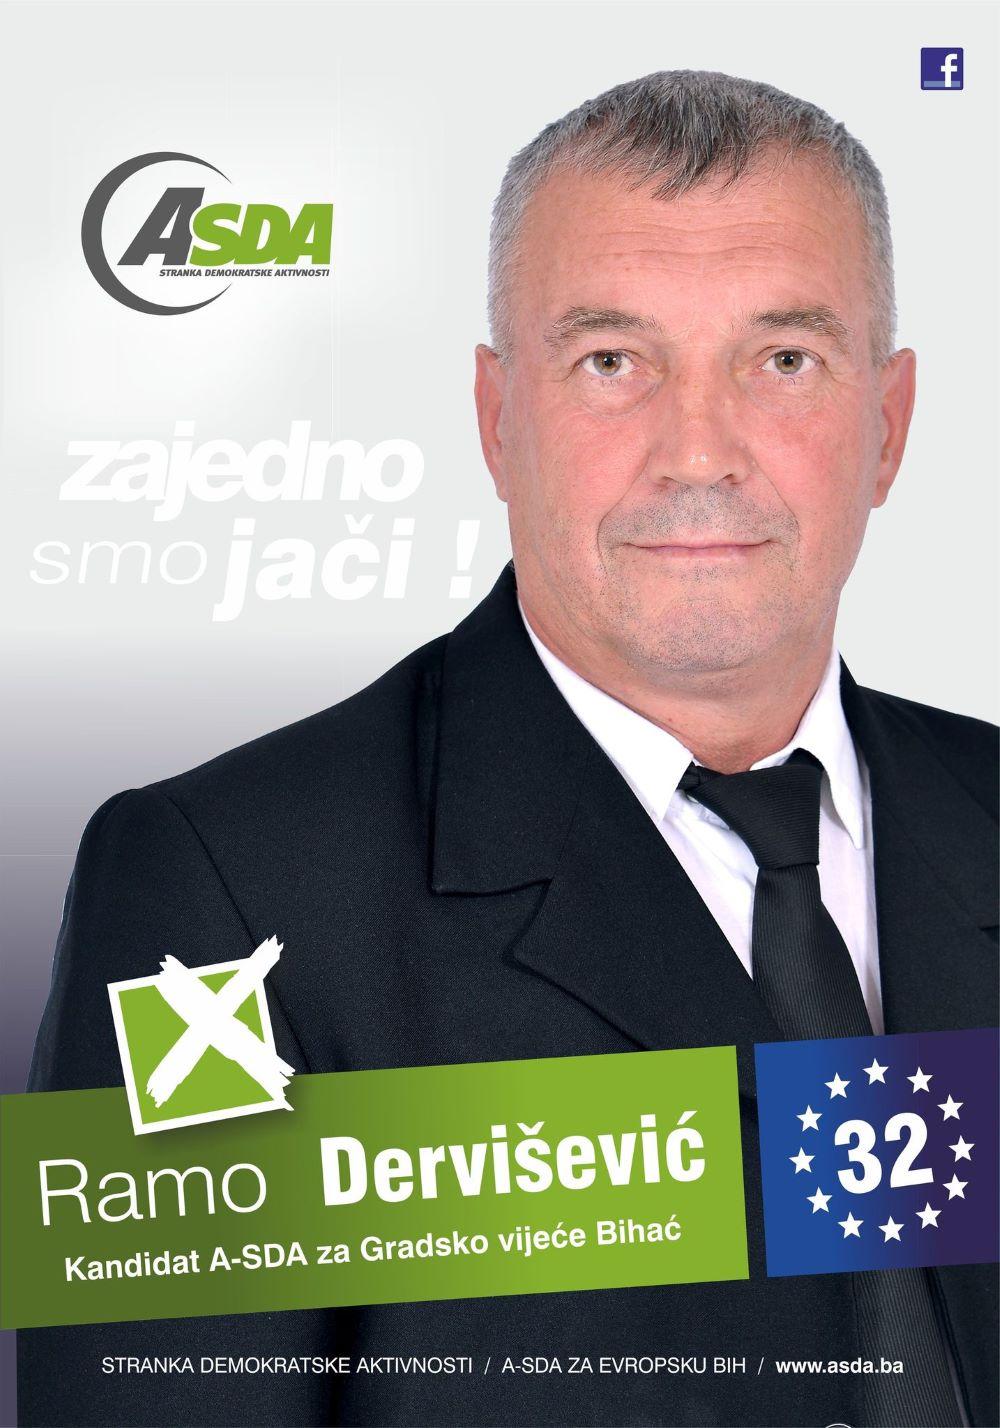 Ramo Dervišević